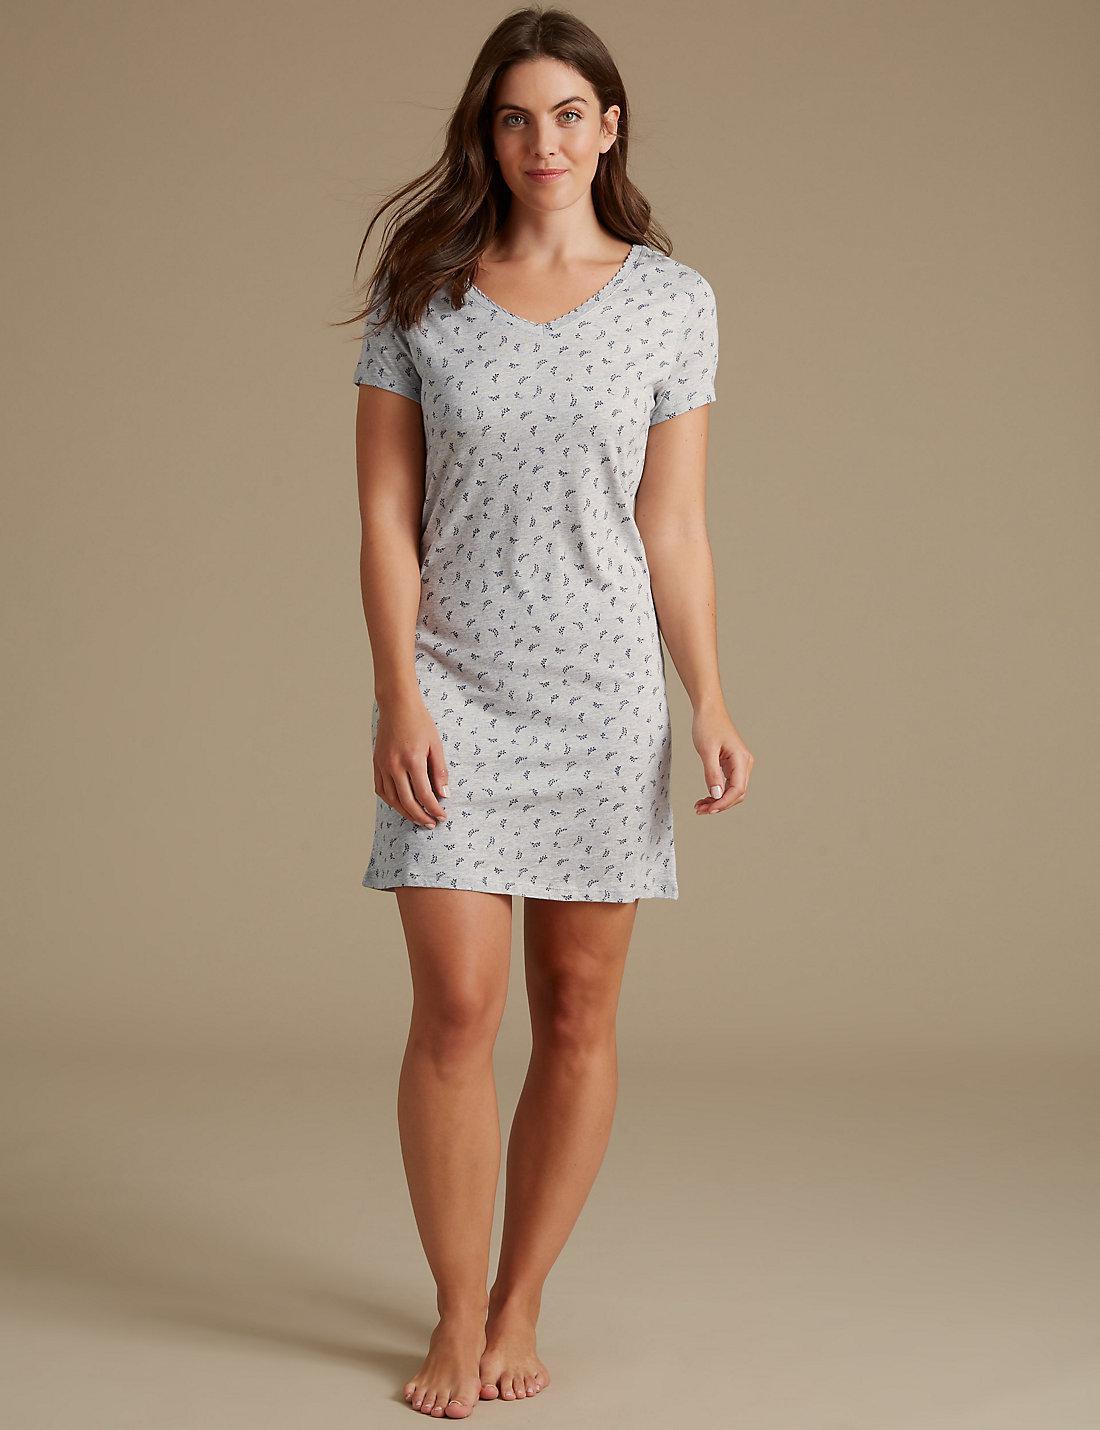 Lyst - Marks   Spencer Modal Blend Printed Nightdress in Gray 53921c3ef